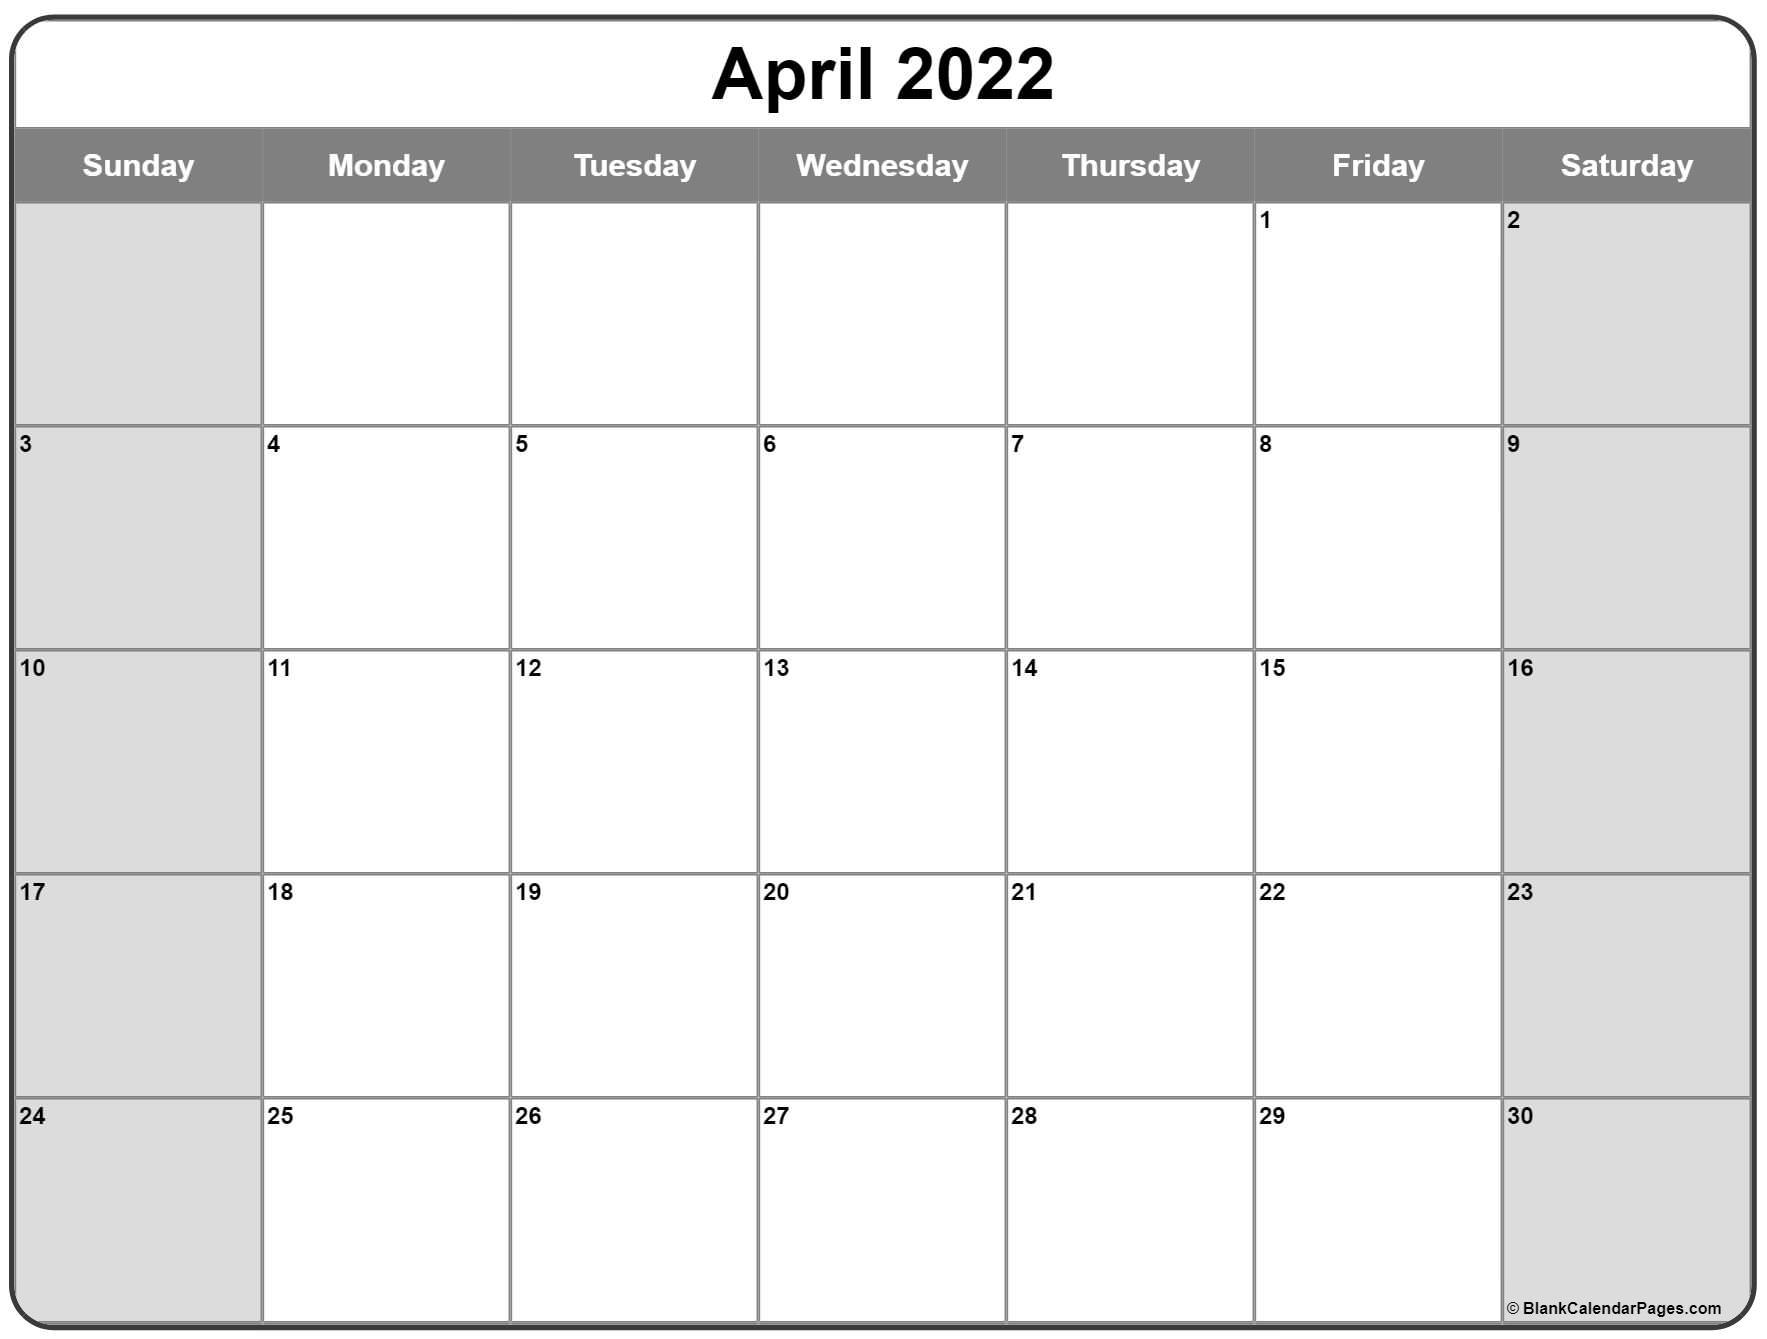 April 2022 Calendar | Free Printable Calendar Templates With Blank Calendar April 2022 Printable February